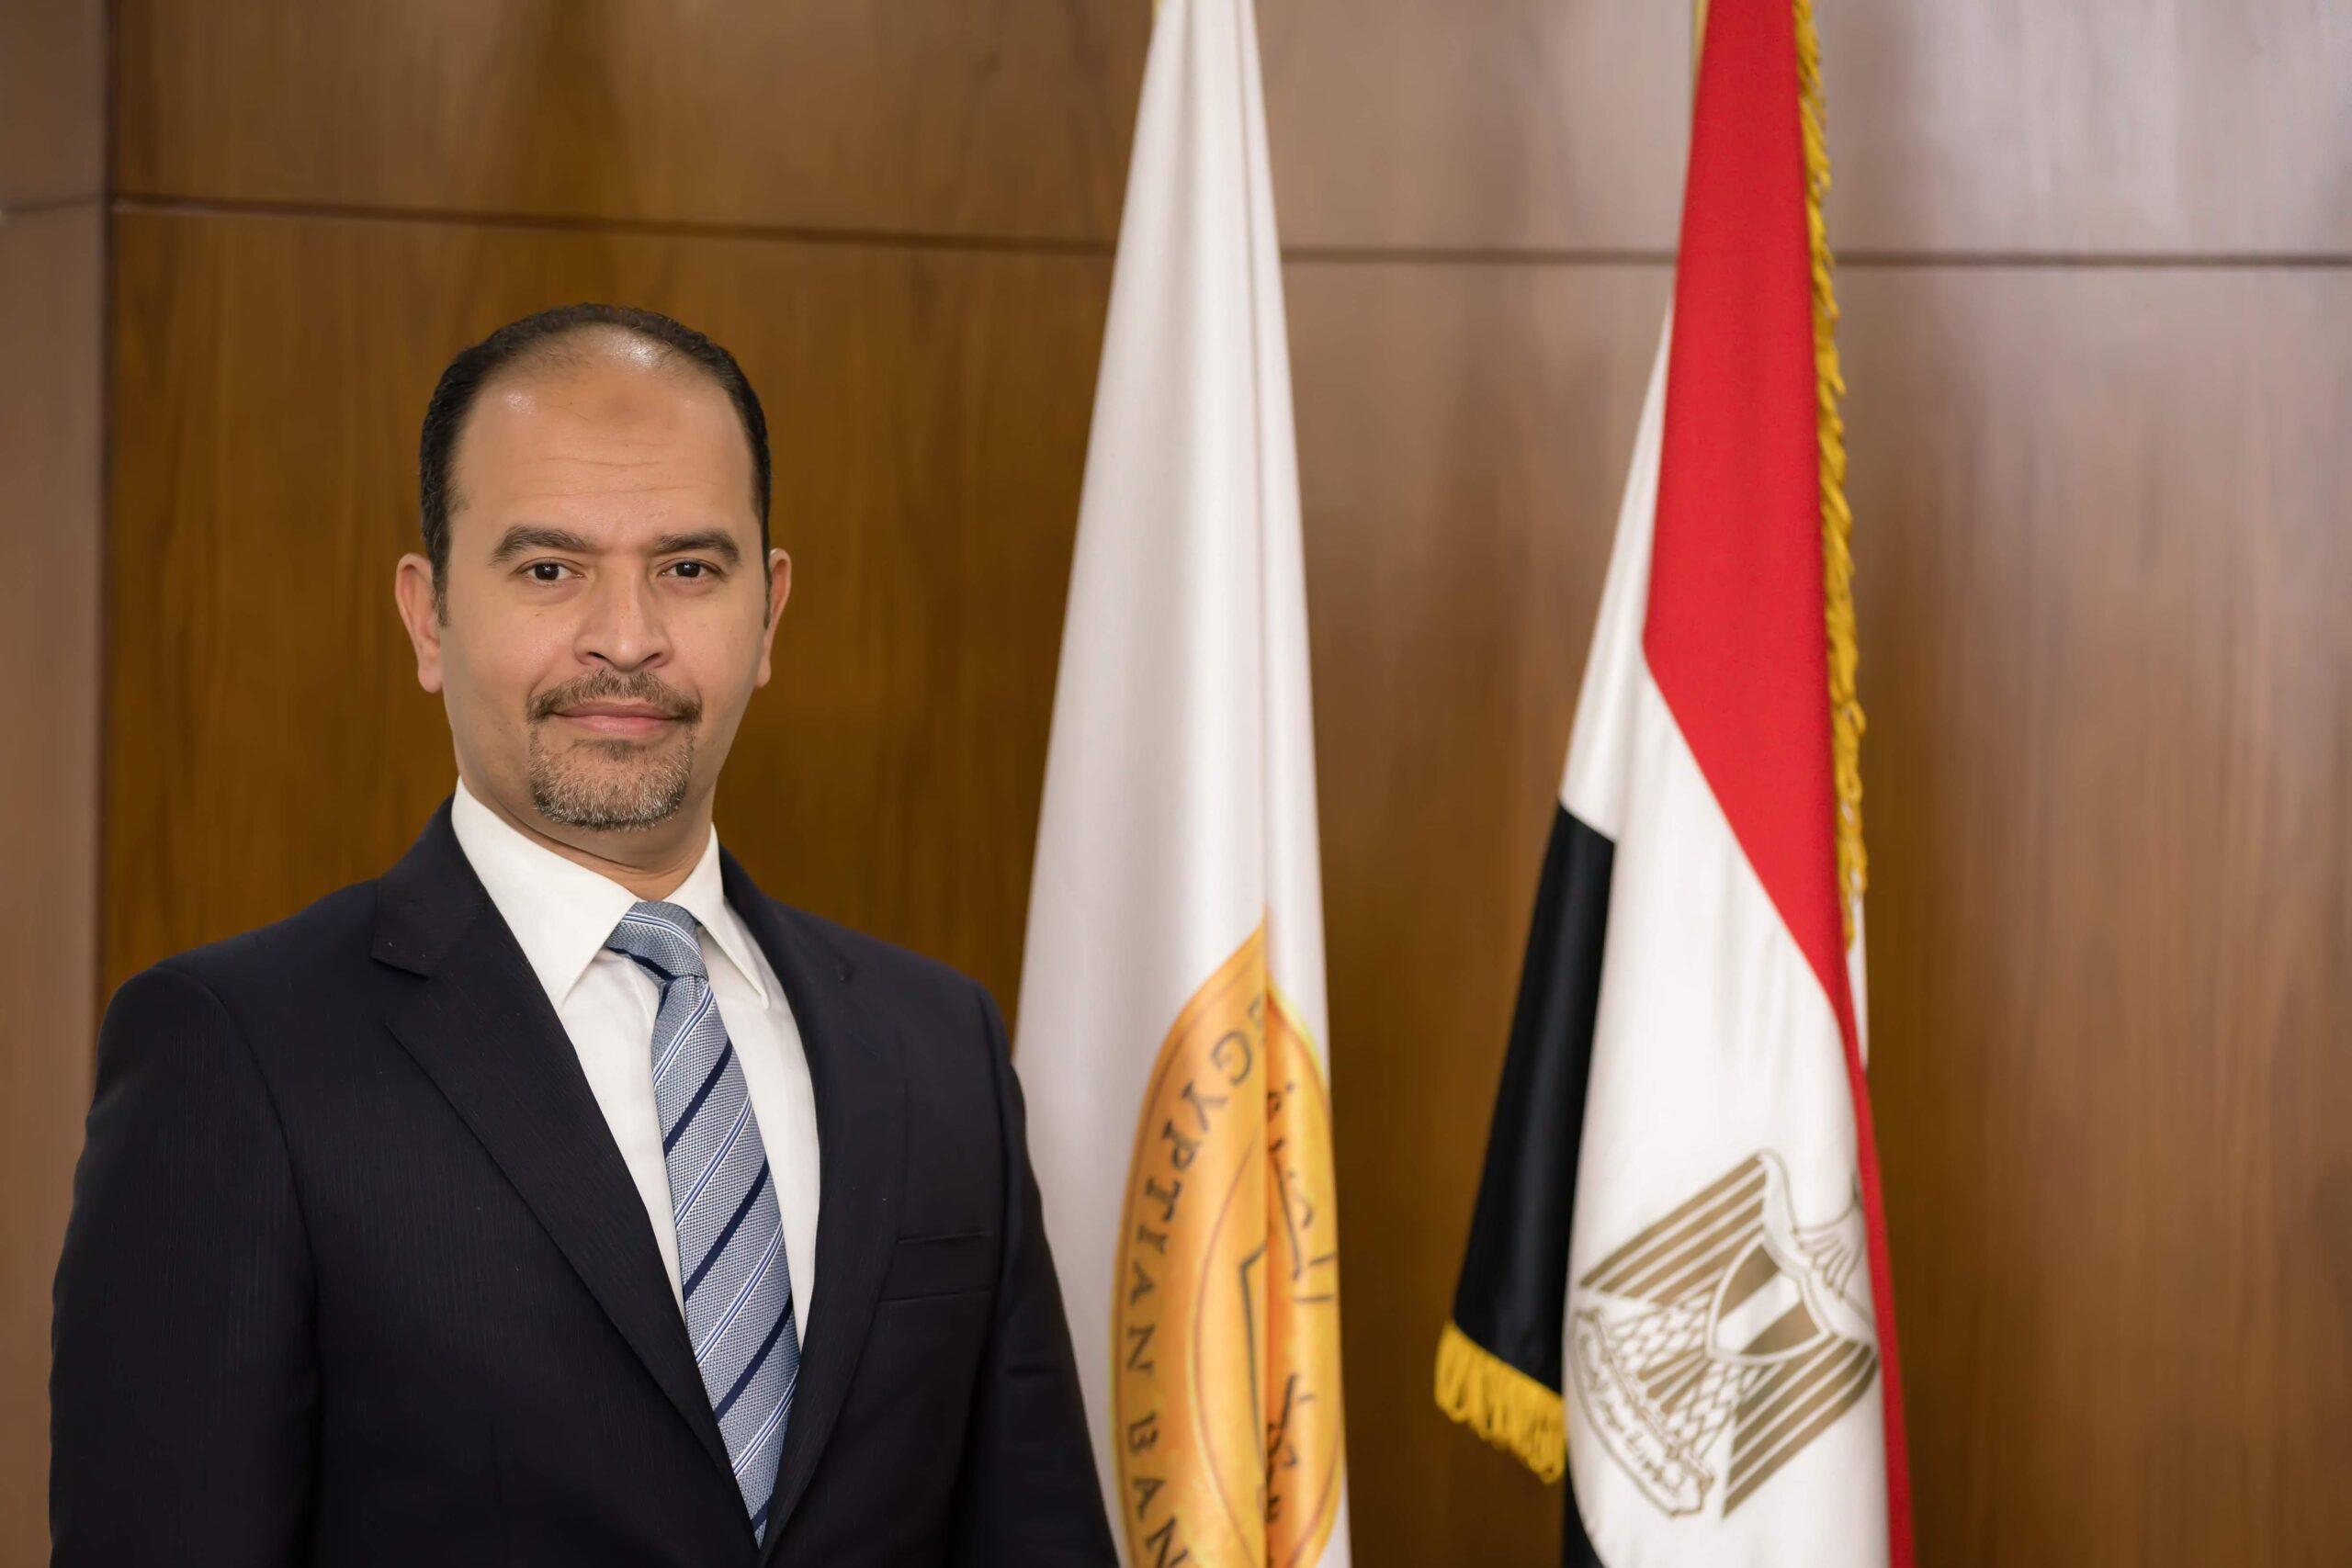 "IMG 1911 scaled - ""المعهد المصرفي المصري (EBI) ينتهي من إعداد أول دراسة مصرية لتحديد المهارات المستقبلية للقطاع المصرفي المصري"""